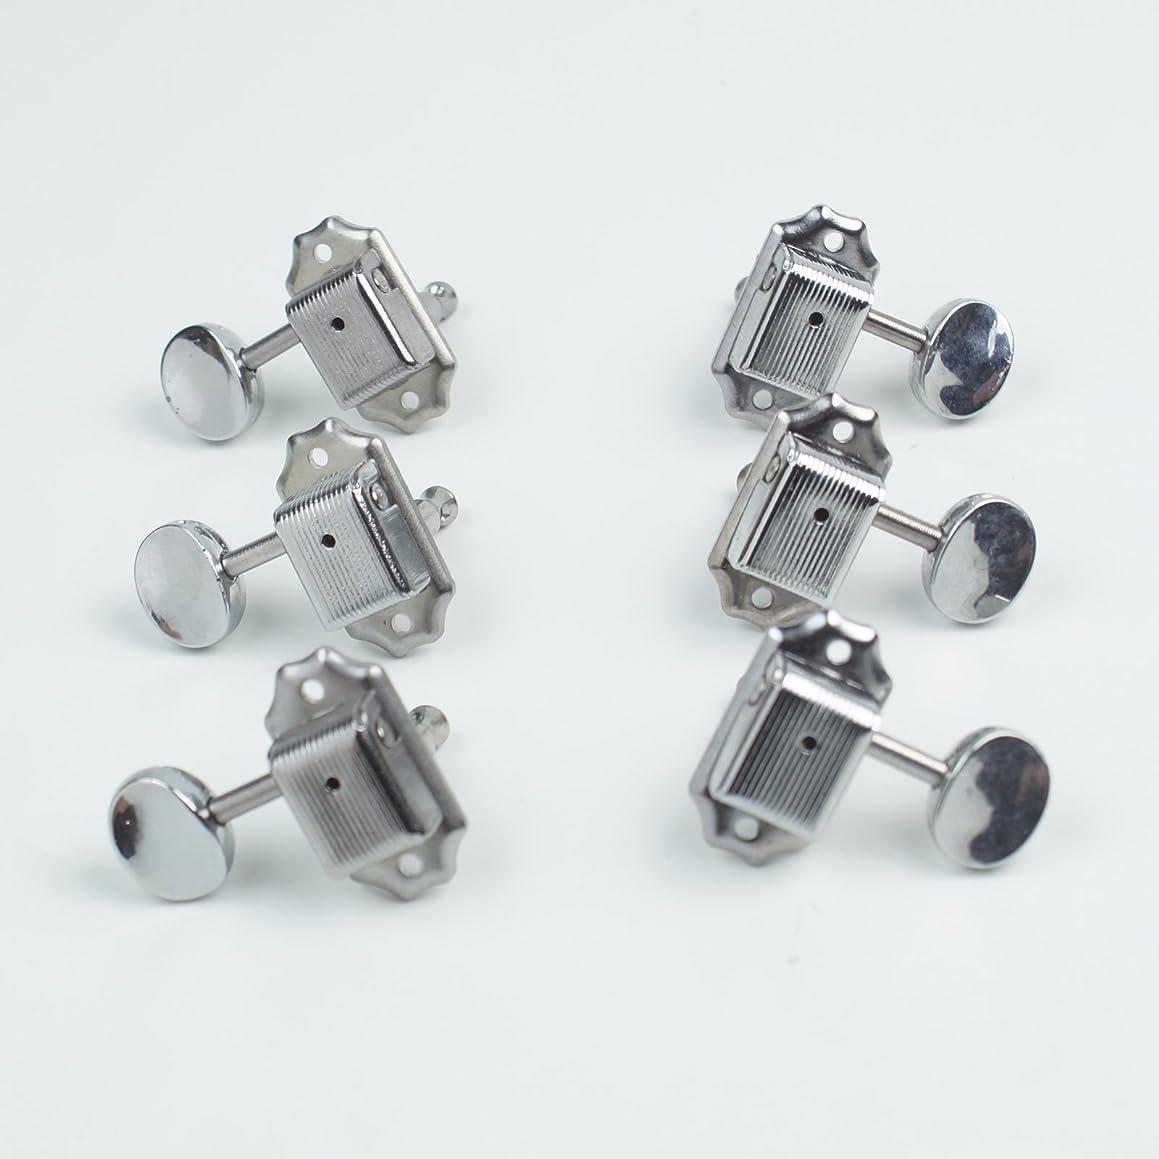 6 Tuning Keys Tuners Head Pegs Chrome